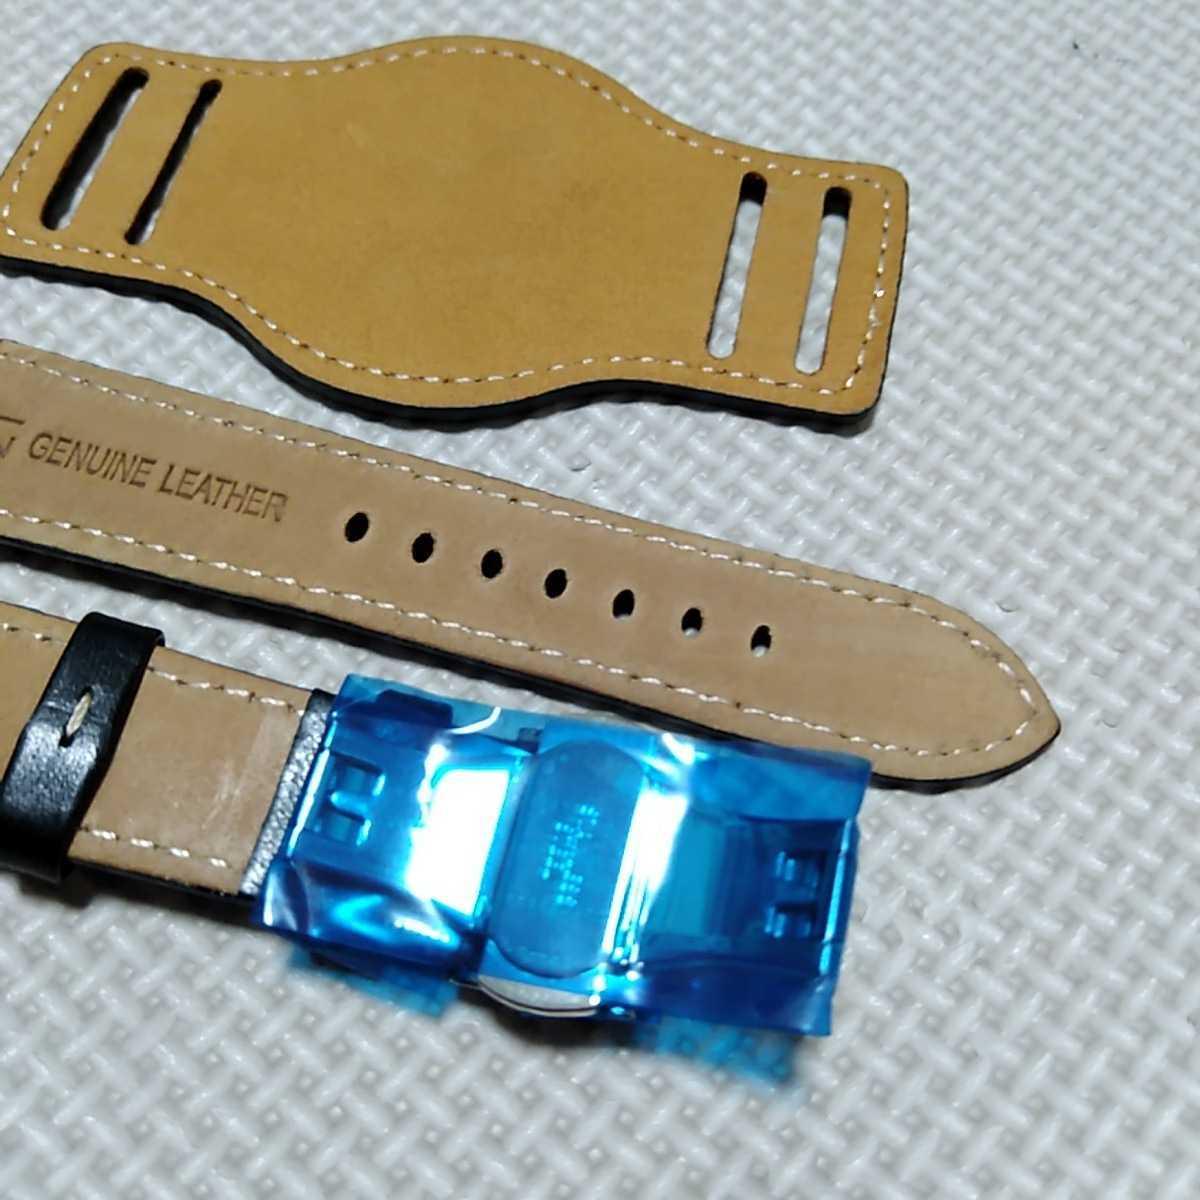 No71 ブンド BUND 本革レザーベルト 腕時計ベルト 交換用ストラップ ブラック 21mm 未使用 Dバックル 高品質 ドイツパイロット 空軍_画像5